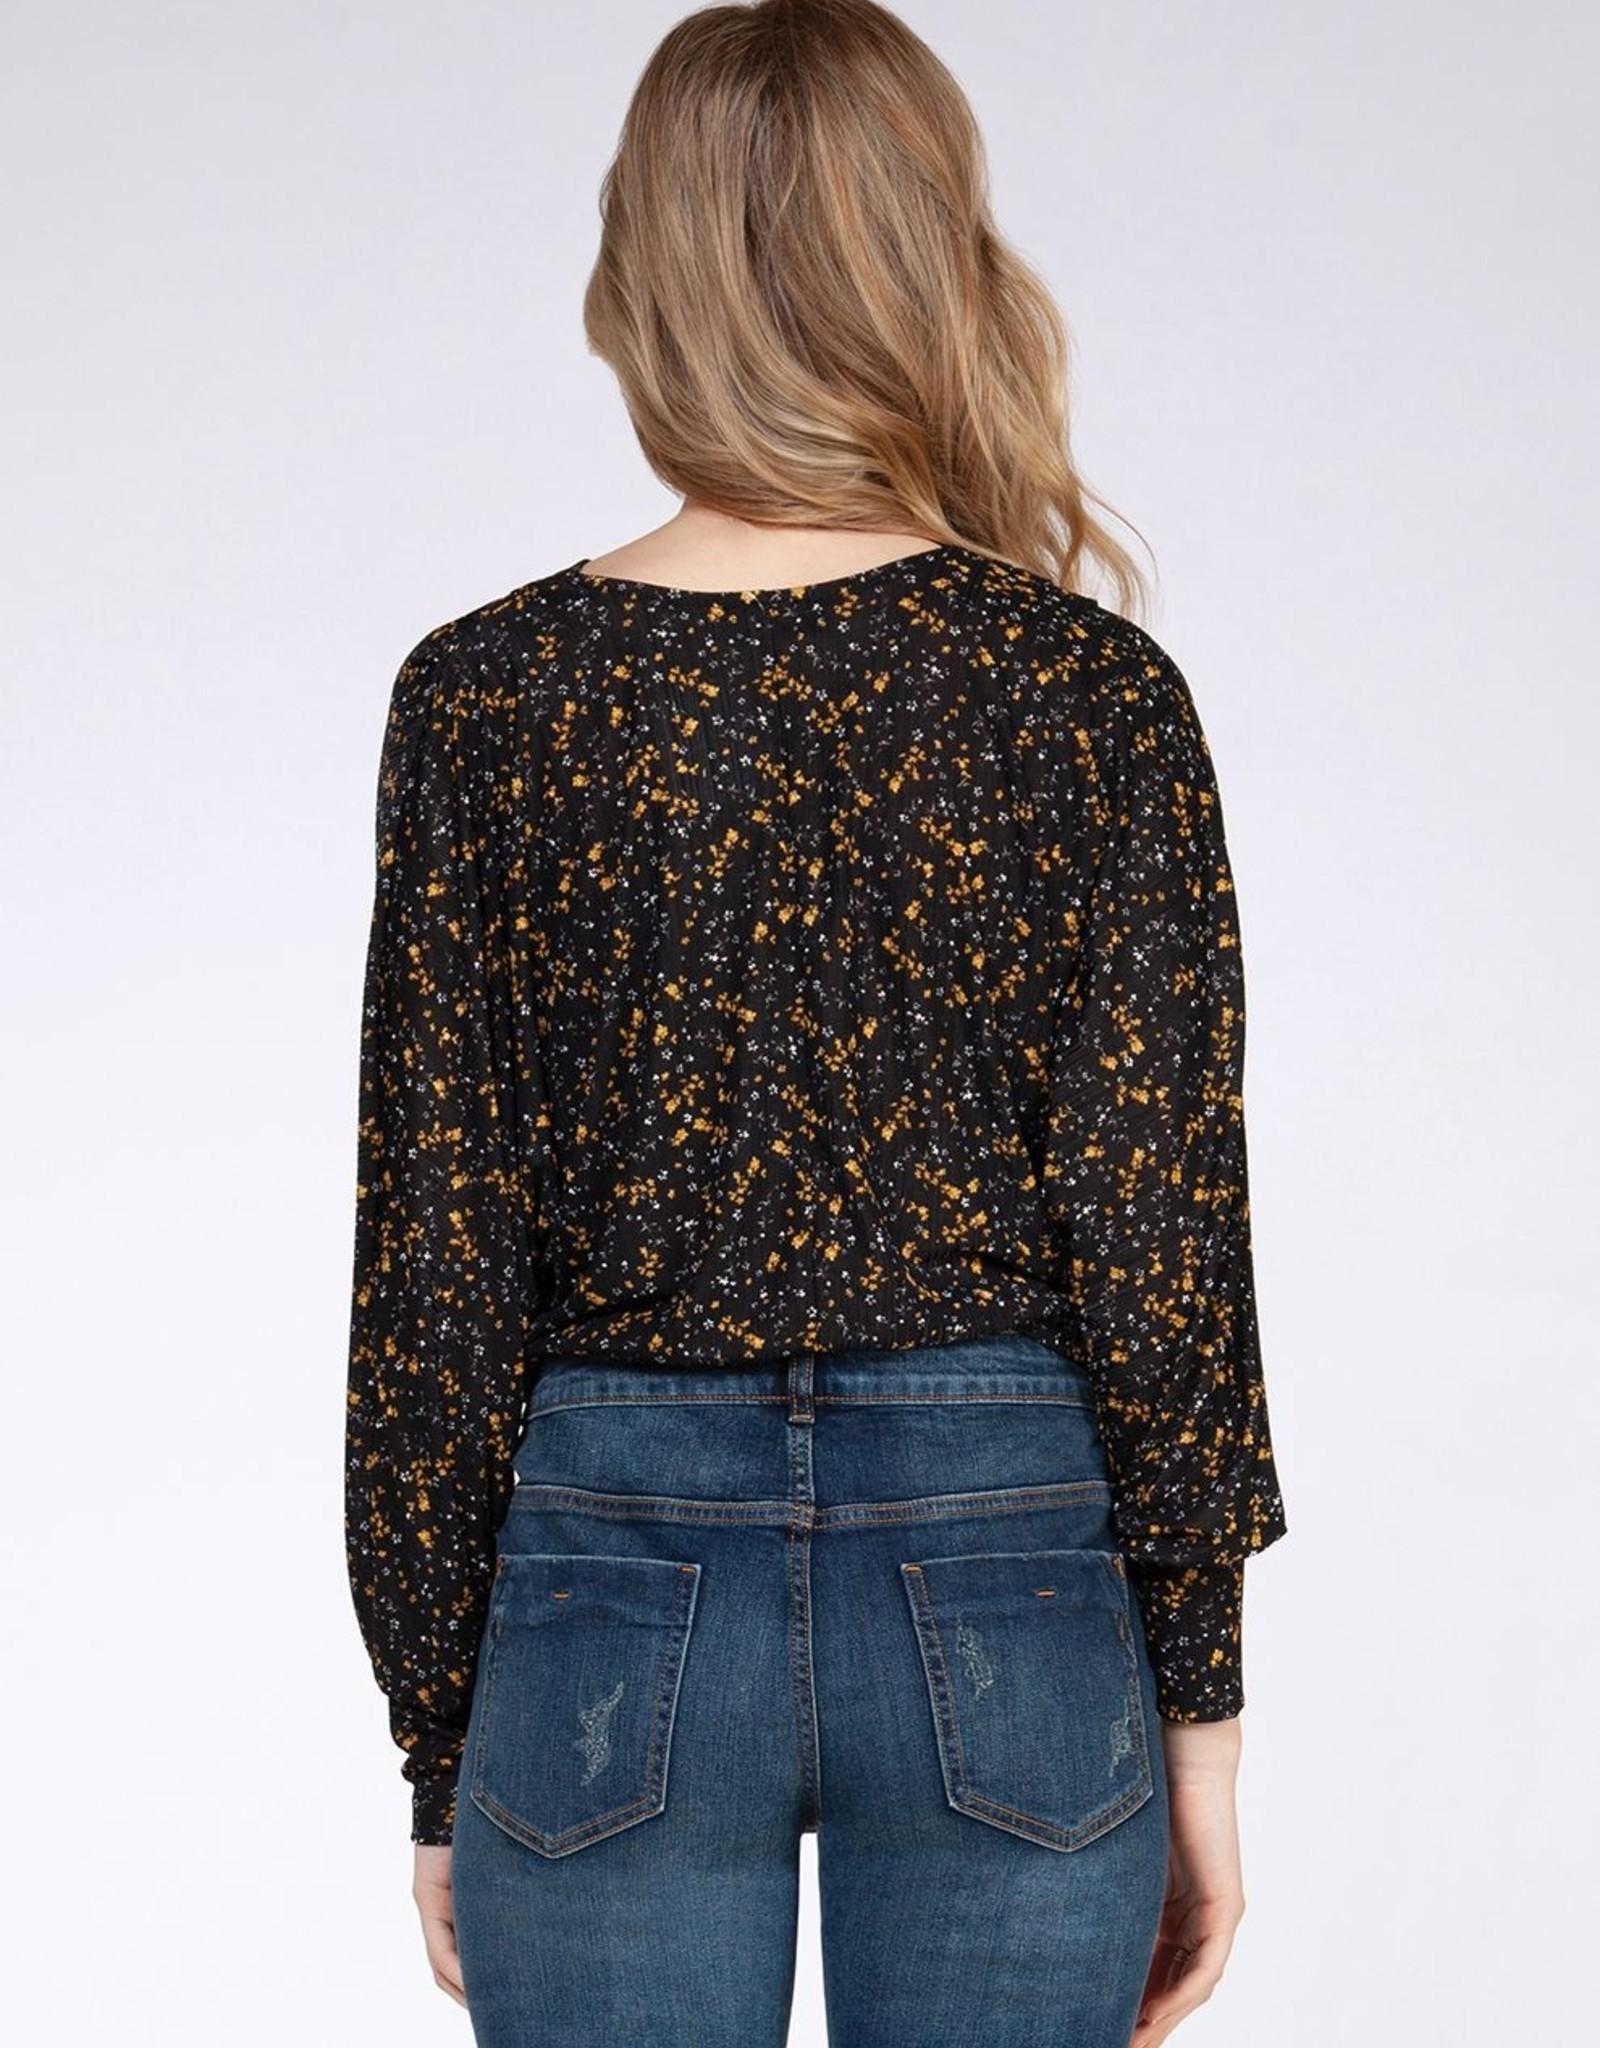 Dex Black/Marigold Floral Top